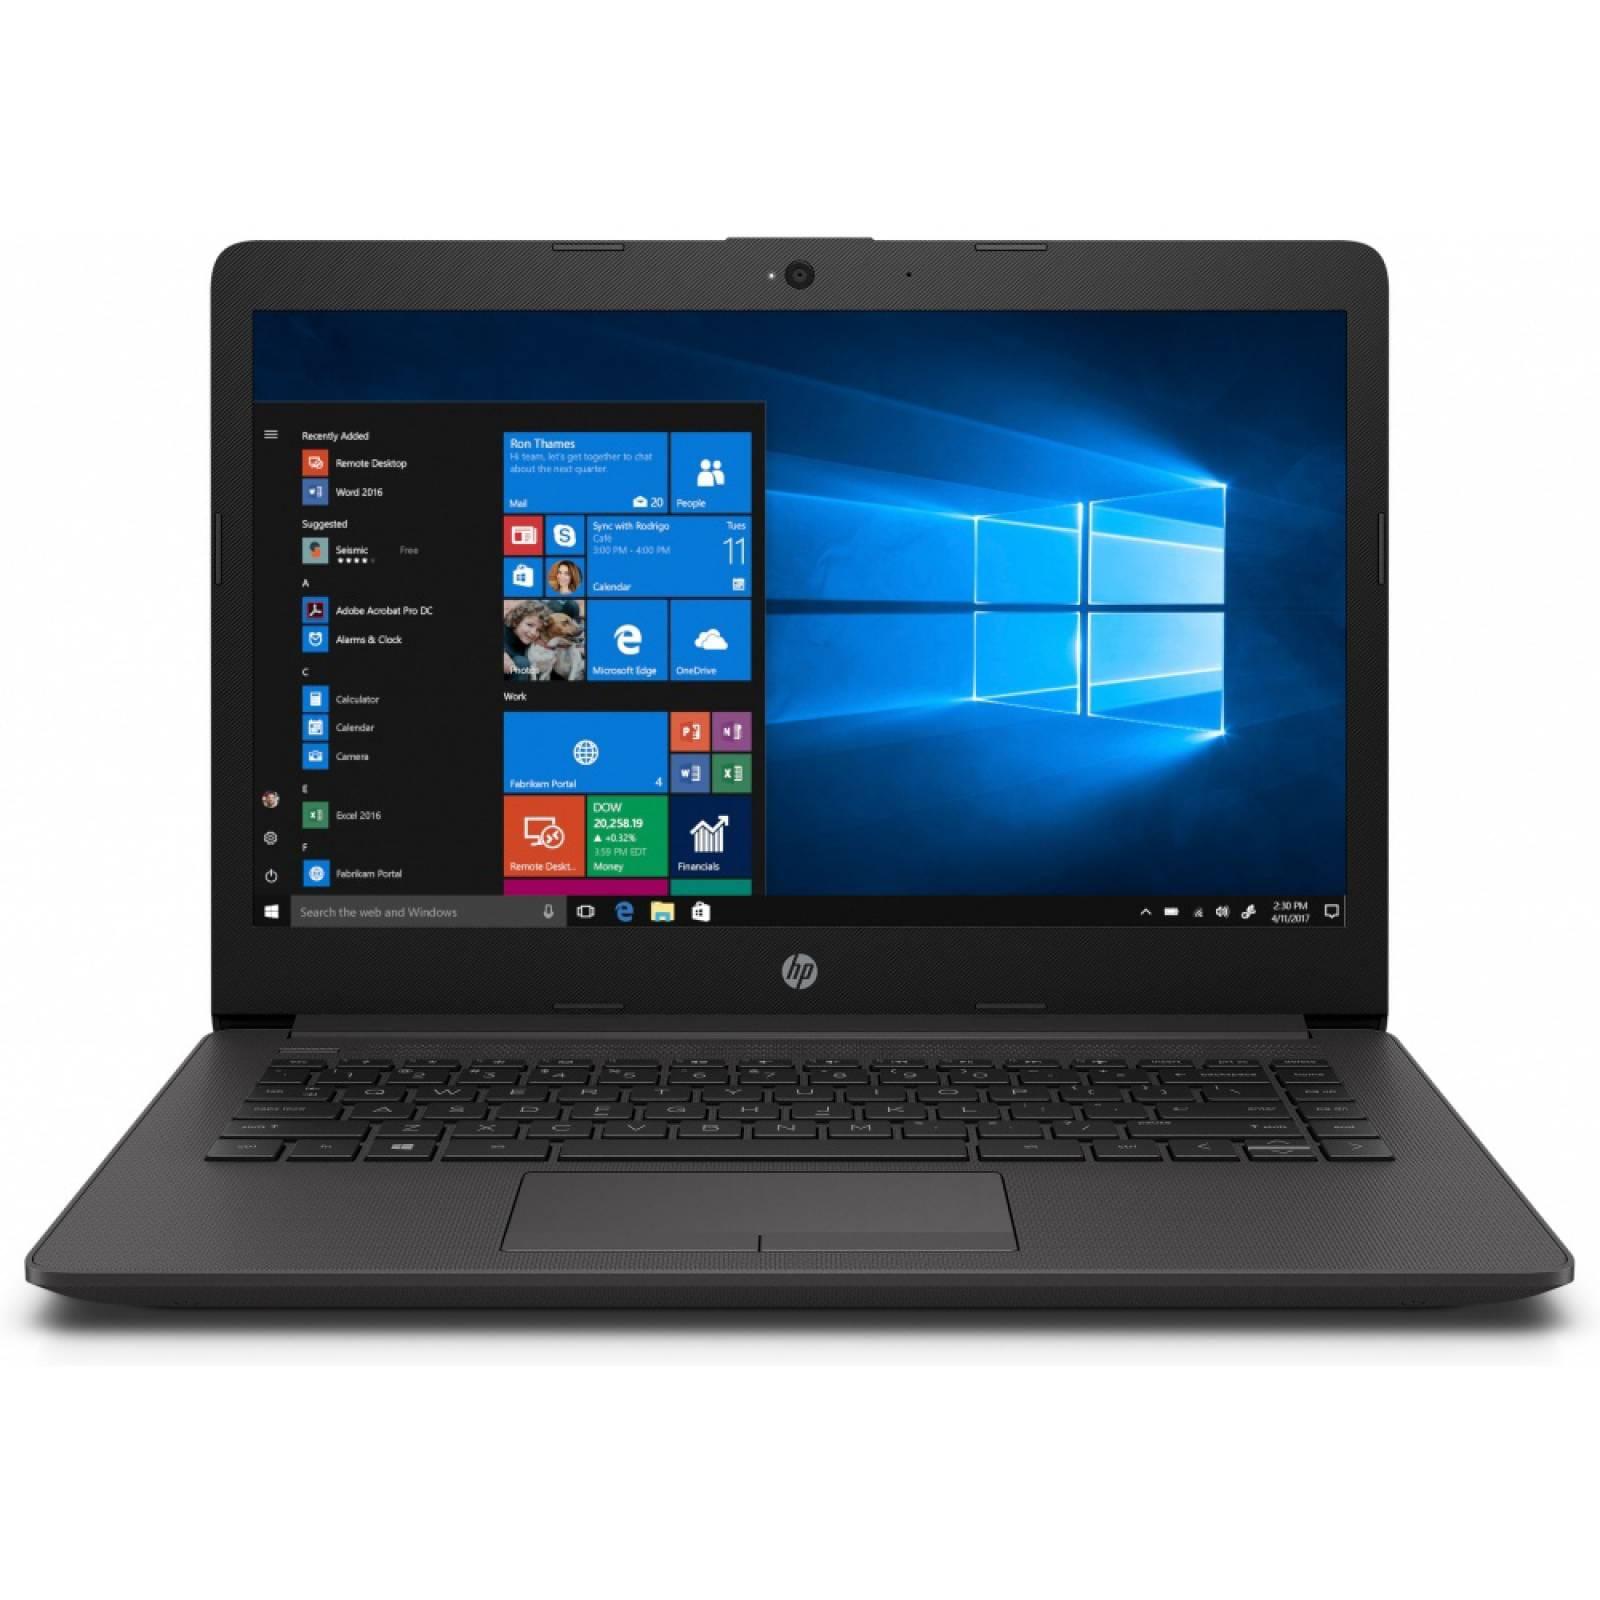 Laptop HP 240 G7: Procesador Intel Celeron N 4000 Memoria de 4GB DDR4, Disco Duro de 500GB, Pantalla de 14 pulgadas LED, Video UHD Graphics 600 Windows 10 Home.